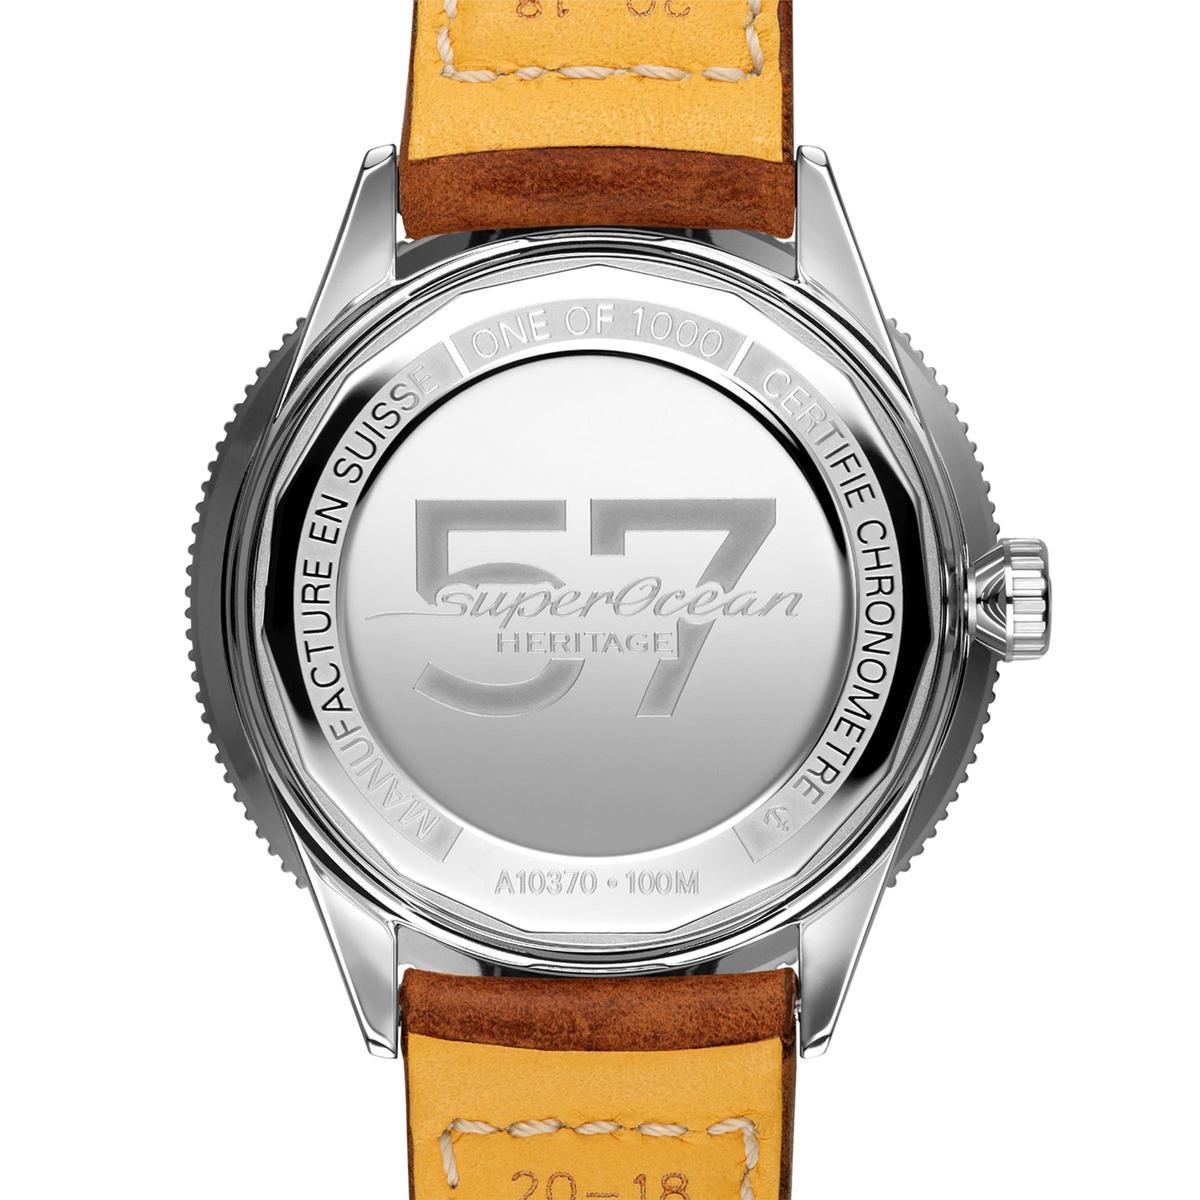 Superocean Heritage 57腕錶在後底蓋寫下大大的57數字,用來紀念Superocean腕錶的起源1957年,同時在限量版上還有ONE OF 1000字樣。